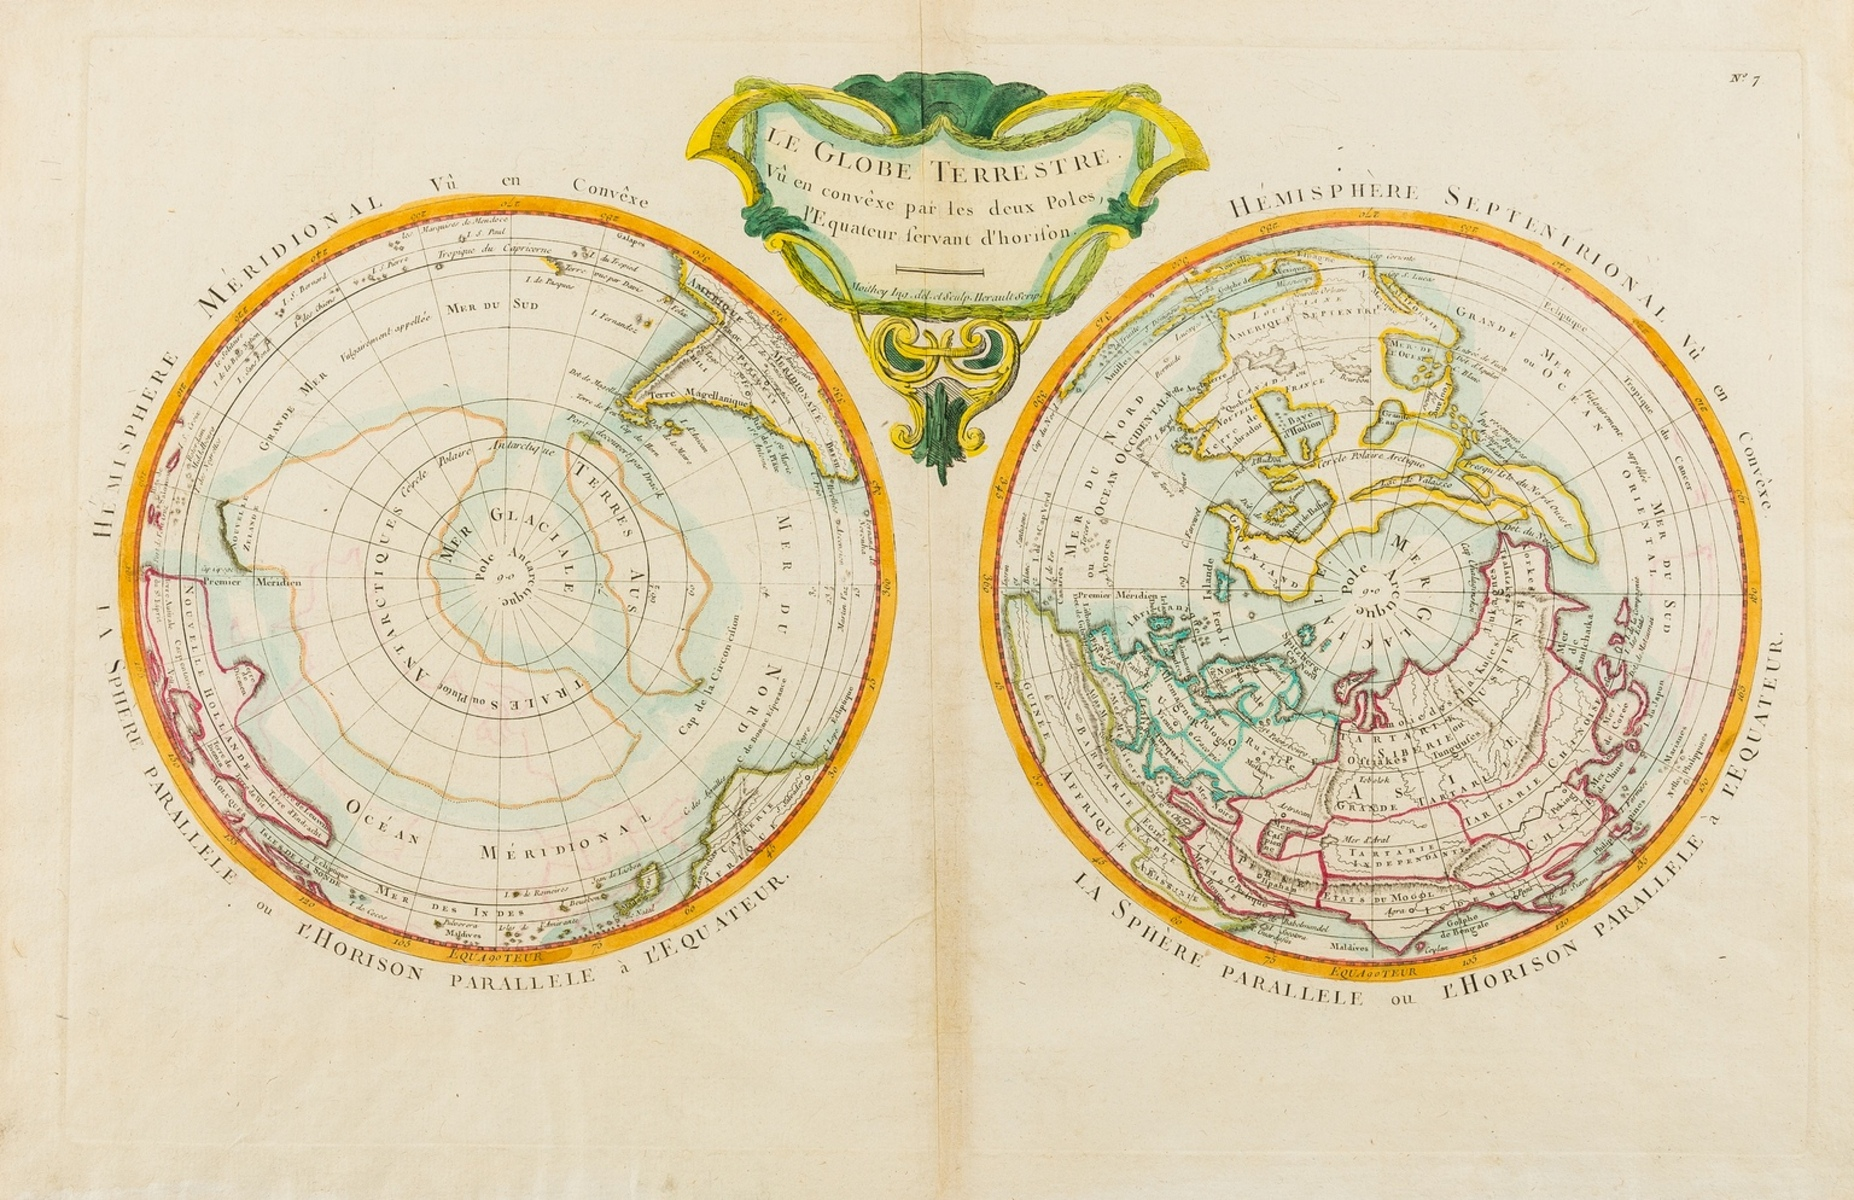 World.- Polar.- Moithey (Maurille Antoine) Le Globe Terrestre Vu en Convexe par les Deux Poles, …